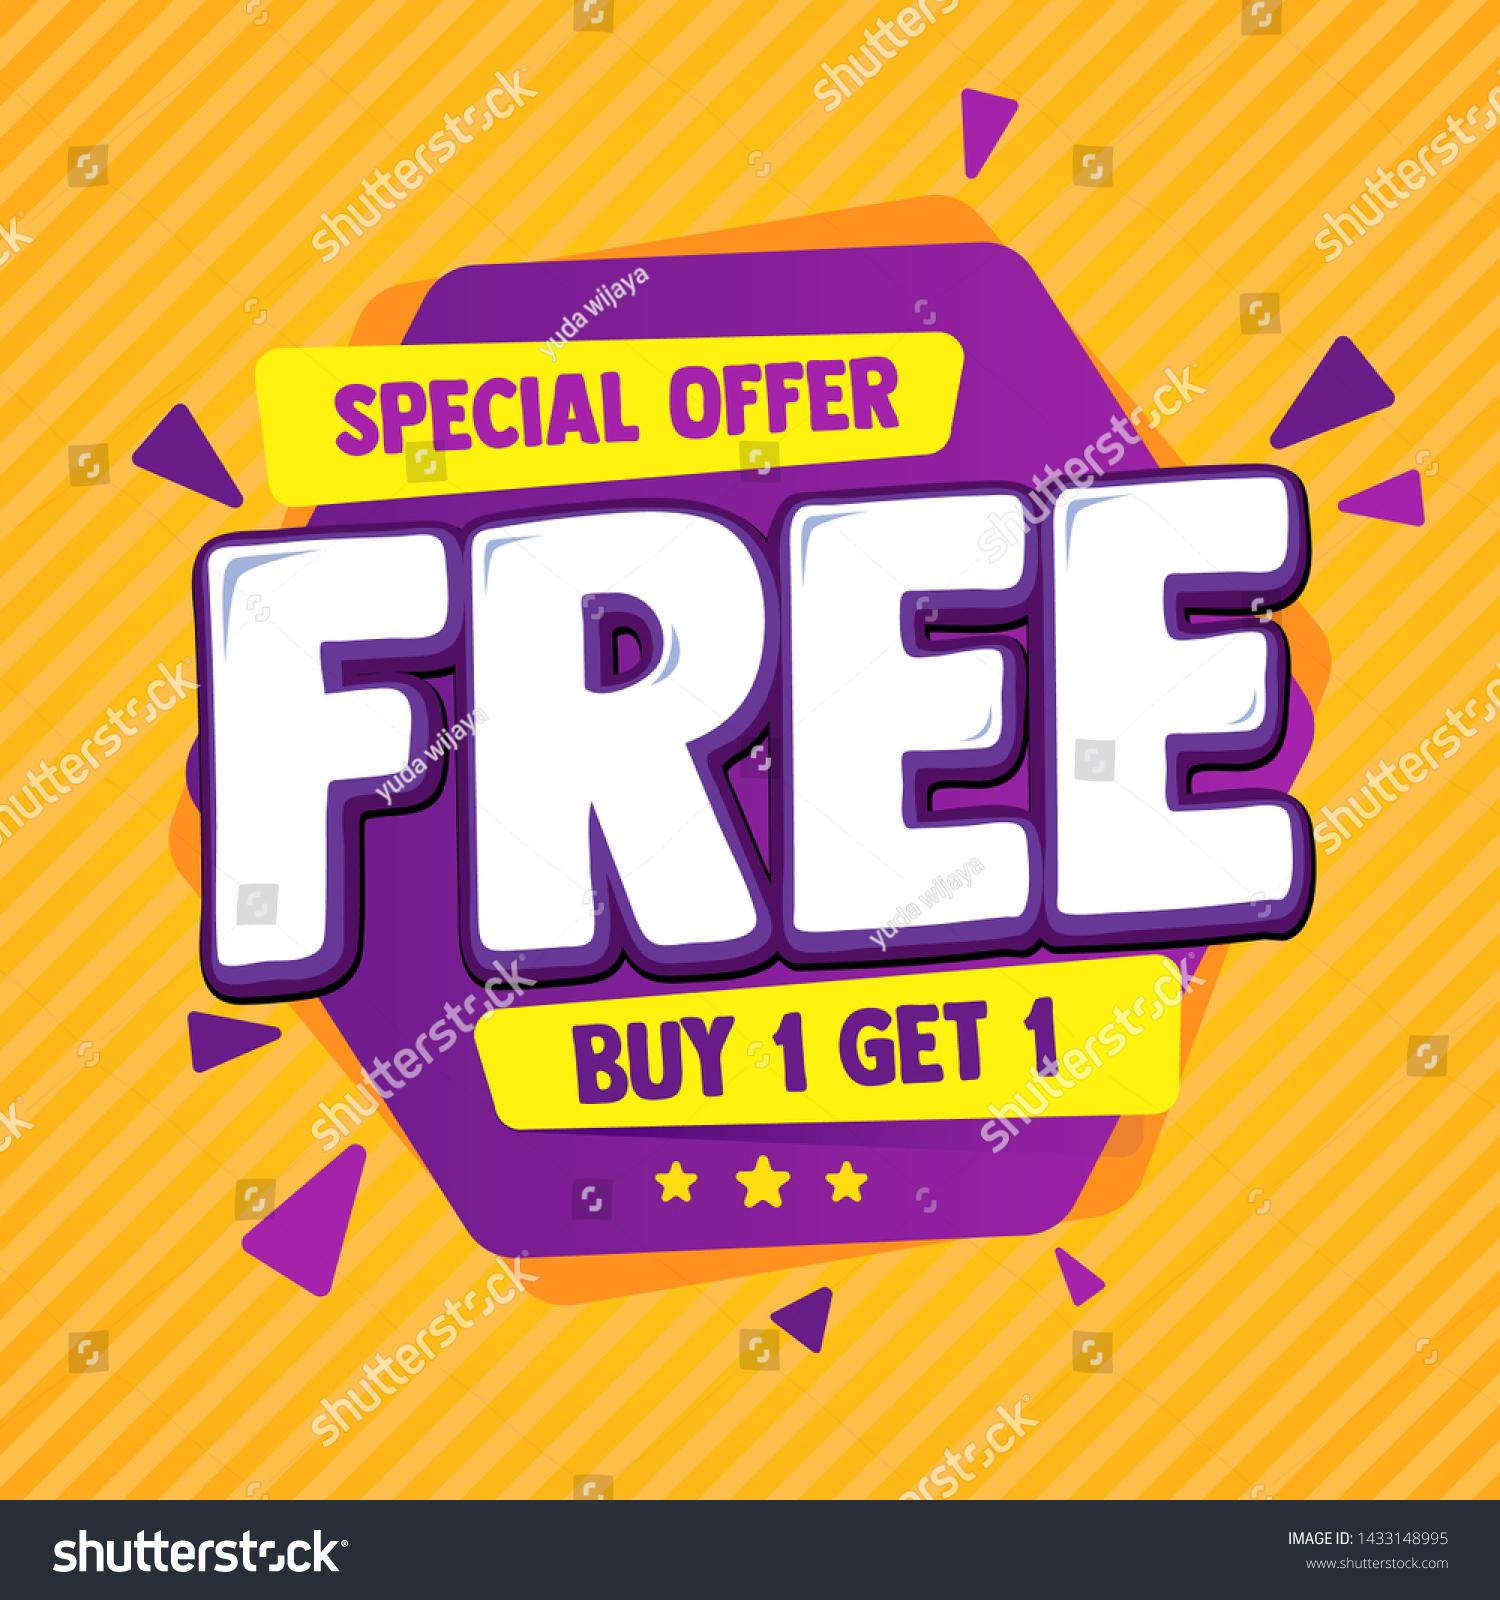 Special offer banner, hot sale, big sale, buy 1 get 1, sale banner vector, purple and orange vector banner